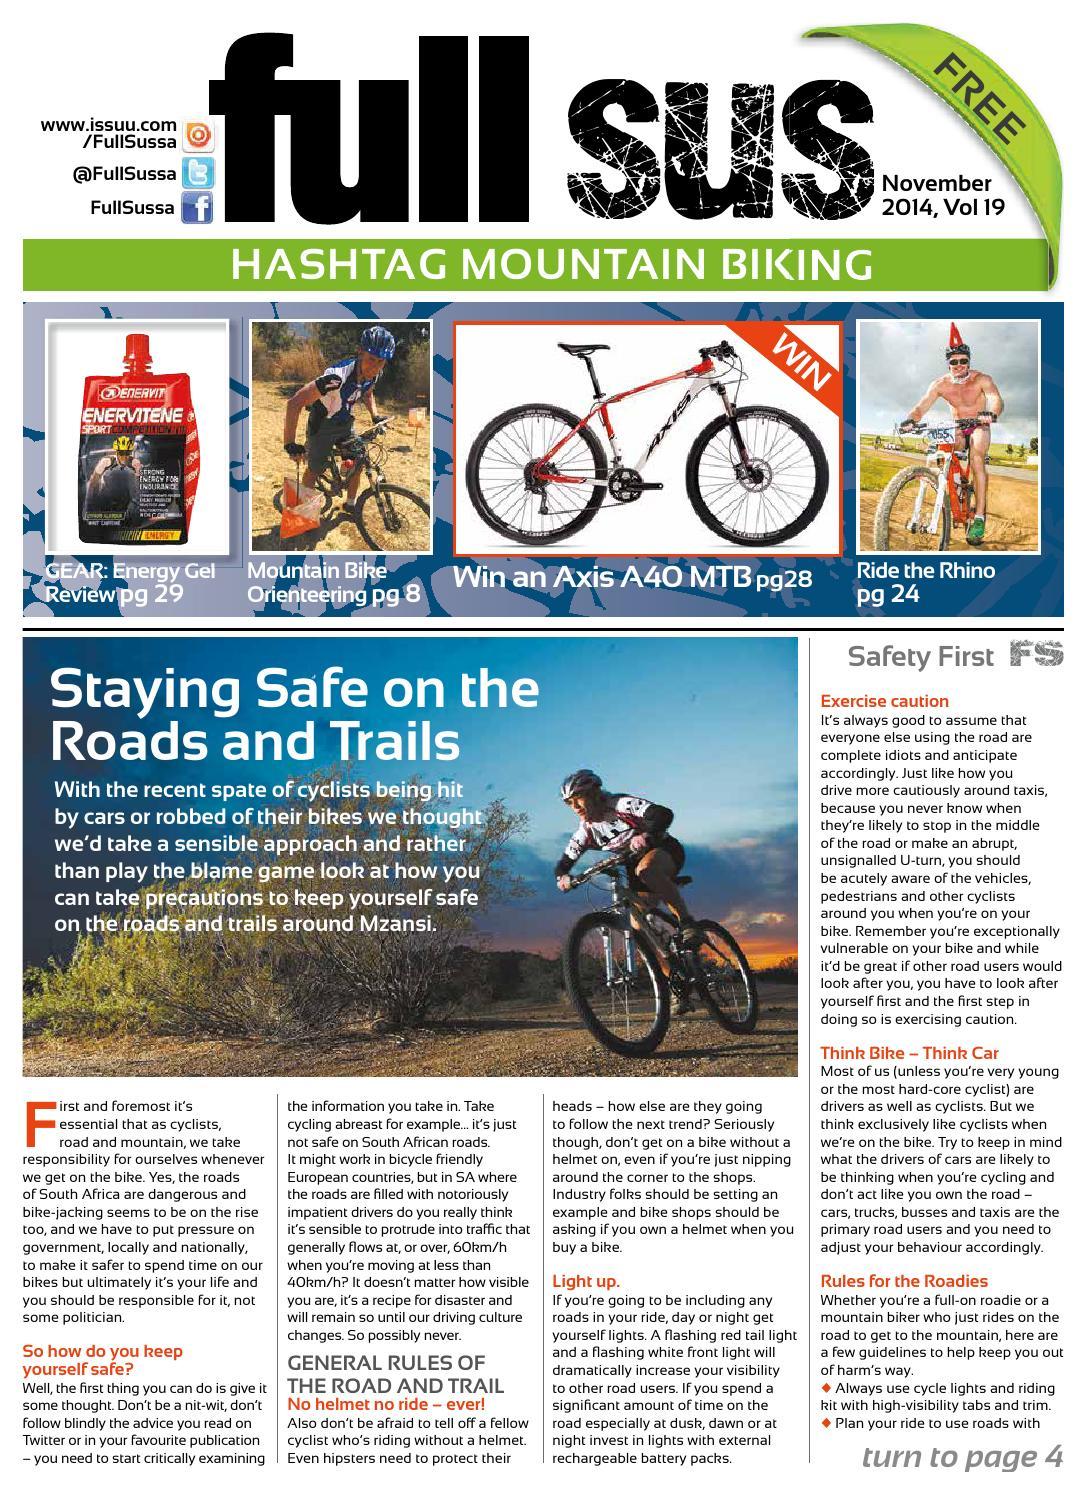 Mountain Bicycle Bottom Bracket Bike Square Hole Crank Axis Sealed Bearing PM